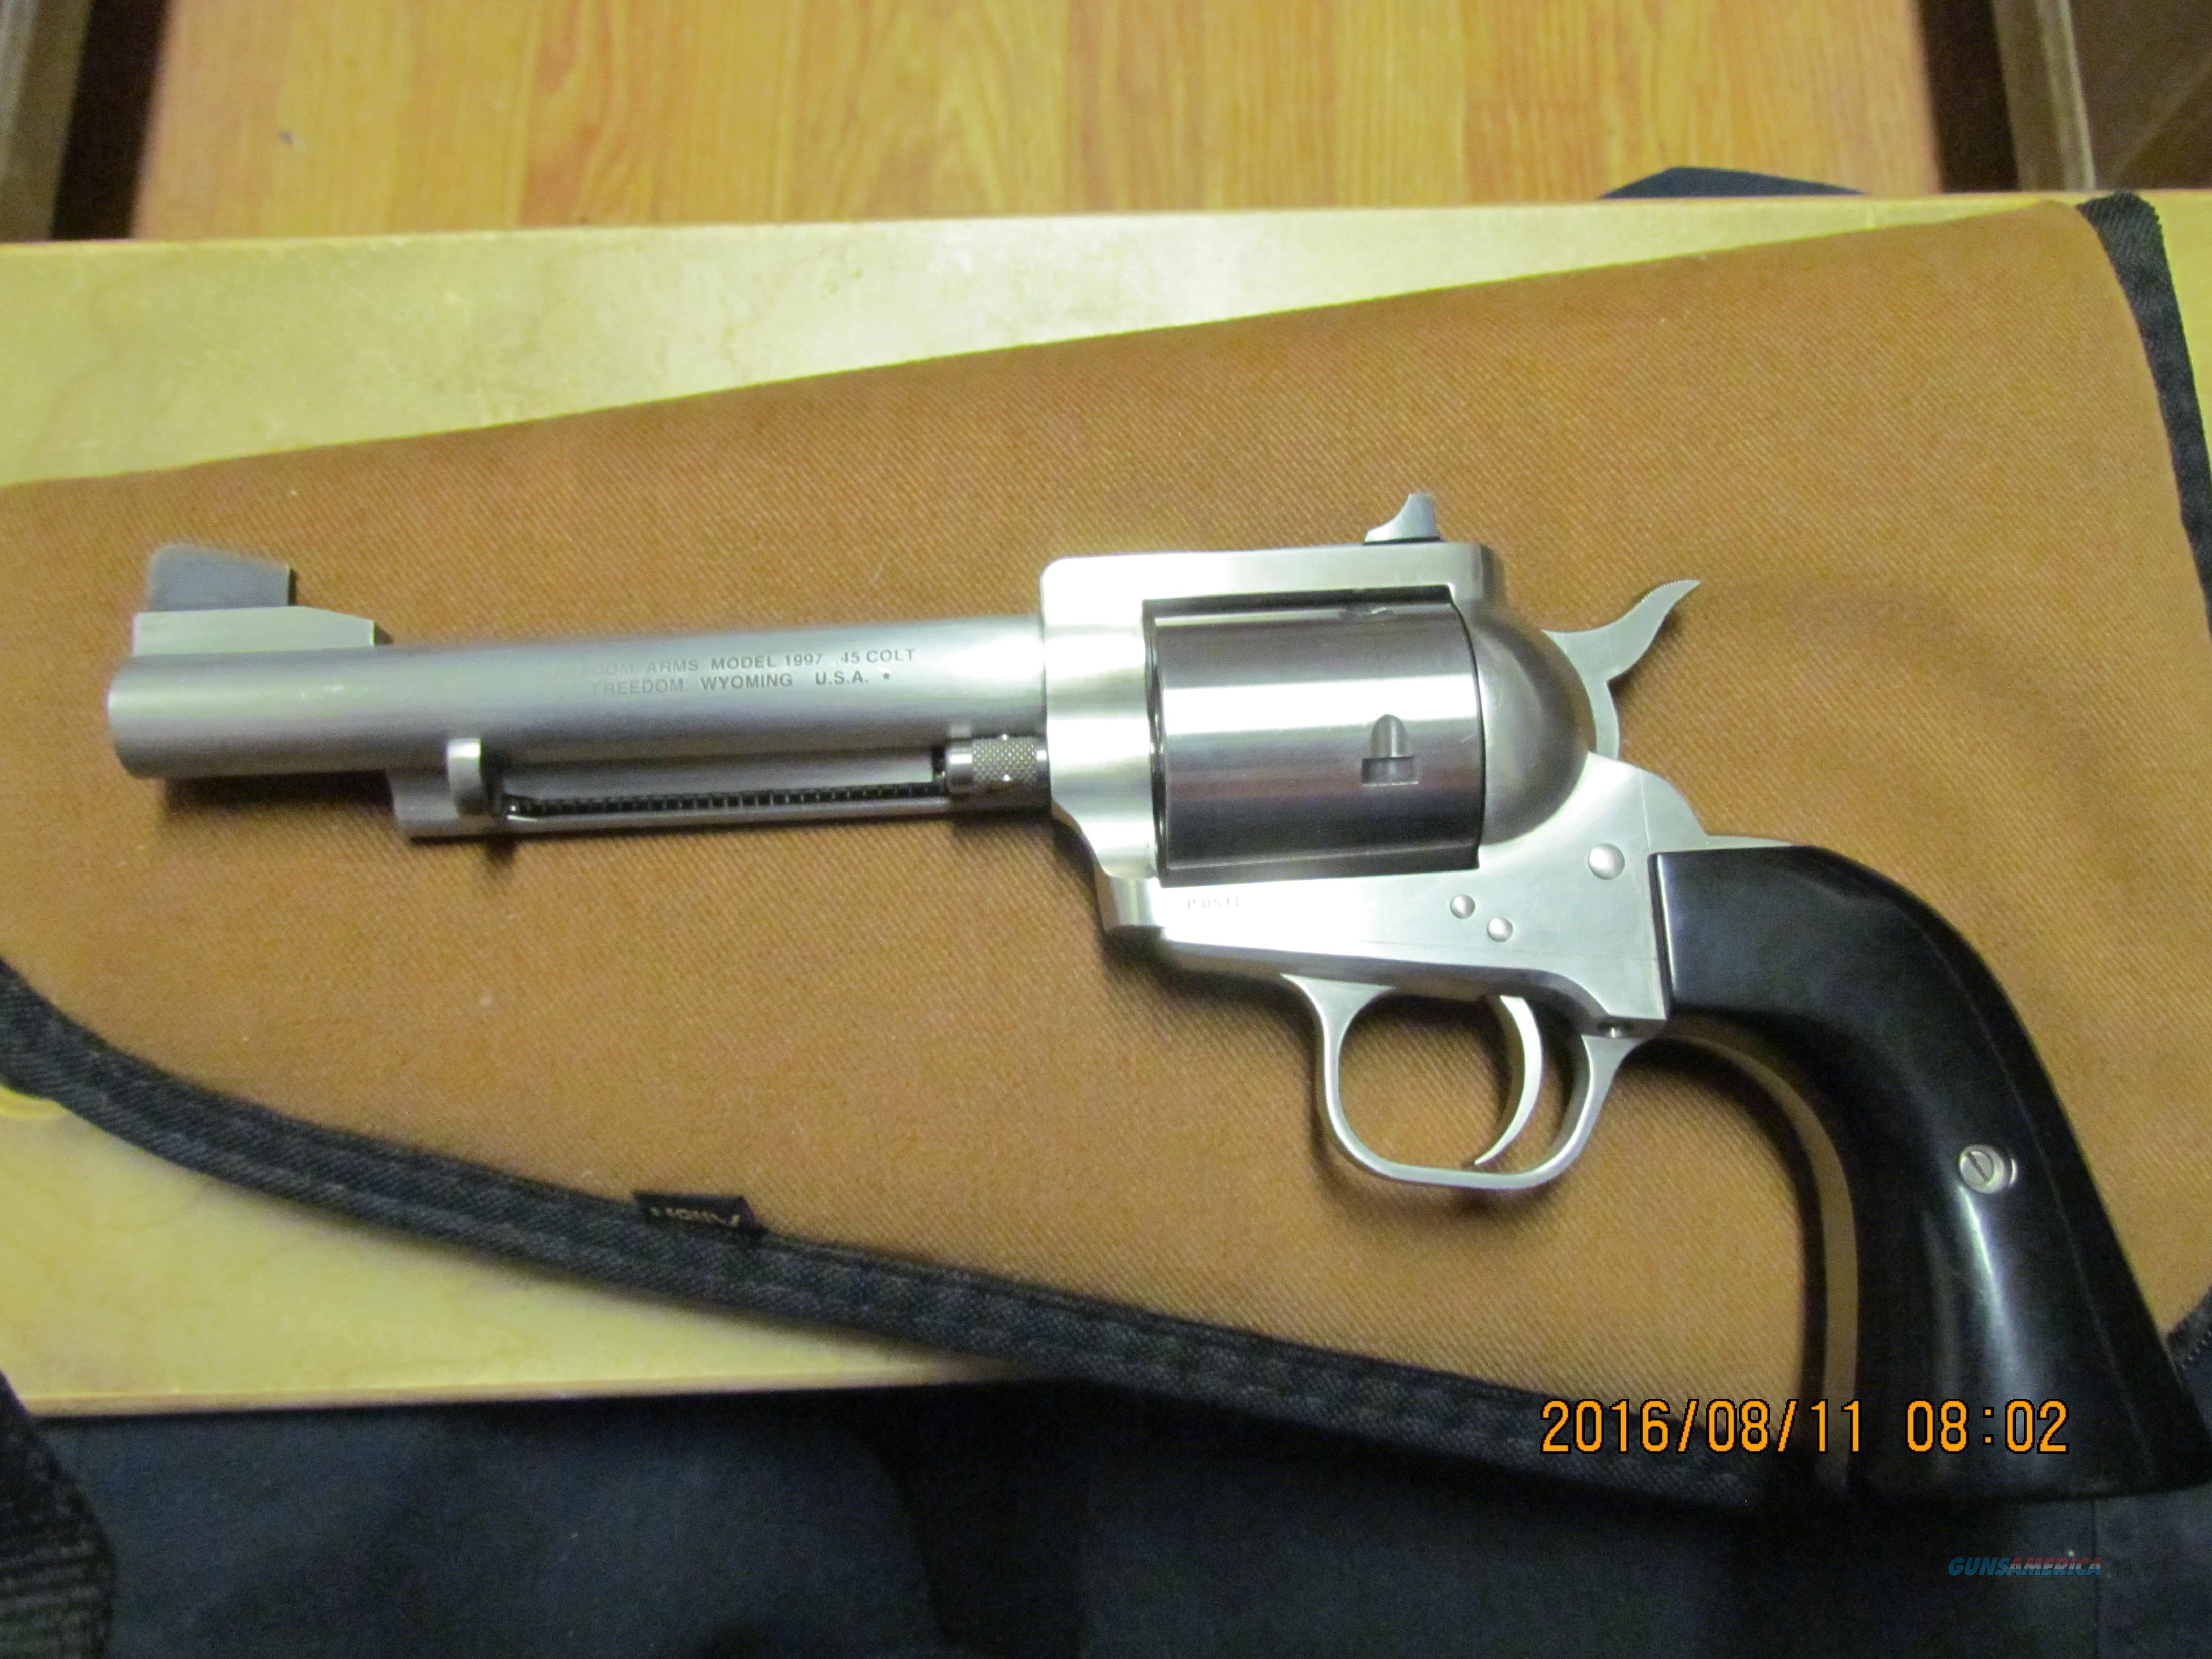 "Freedom Arms Model 97 45 Colt 5 1/2"" Barrel w/Black Micarta Grips in box w/snap caps & lock  Guns > Pistols > Freedom Arms Pistols"